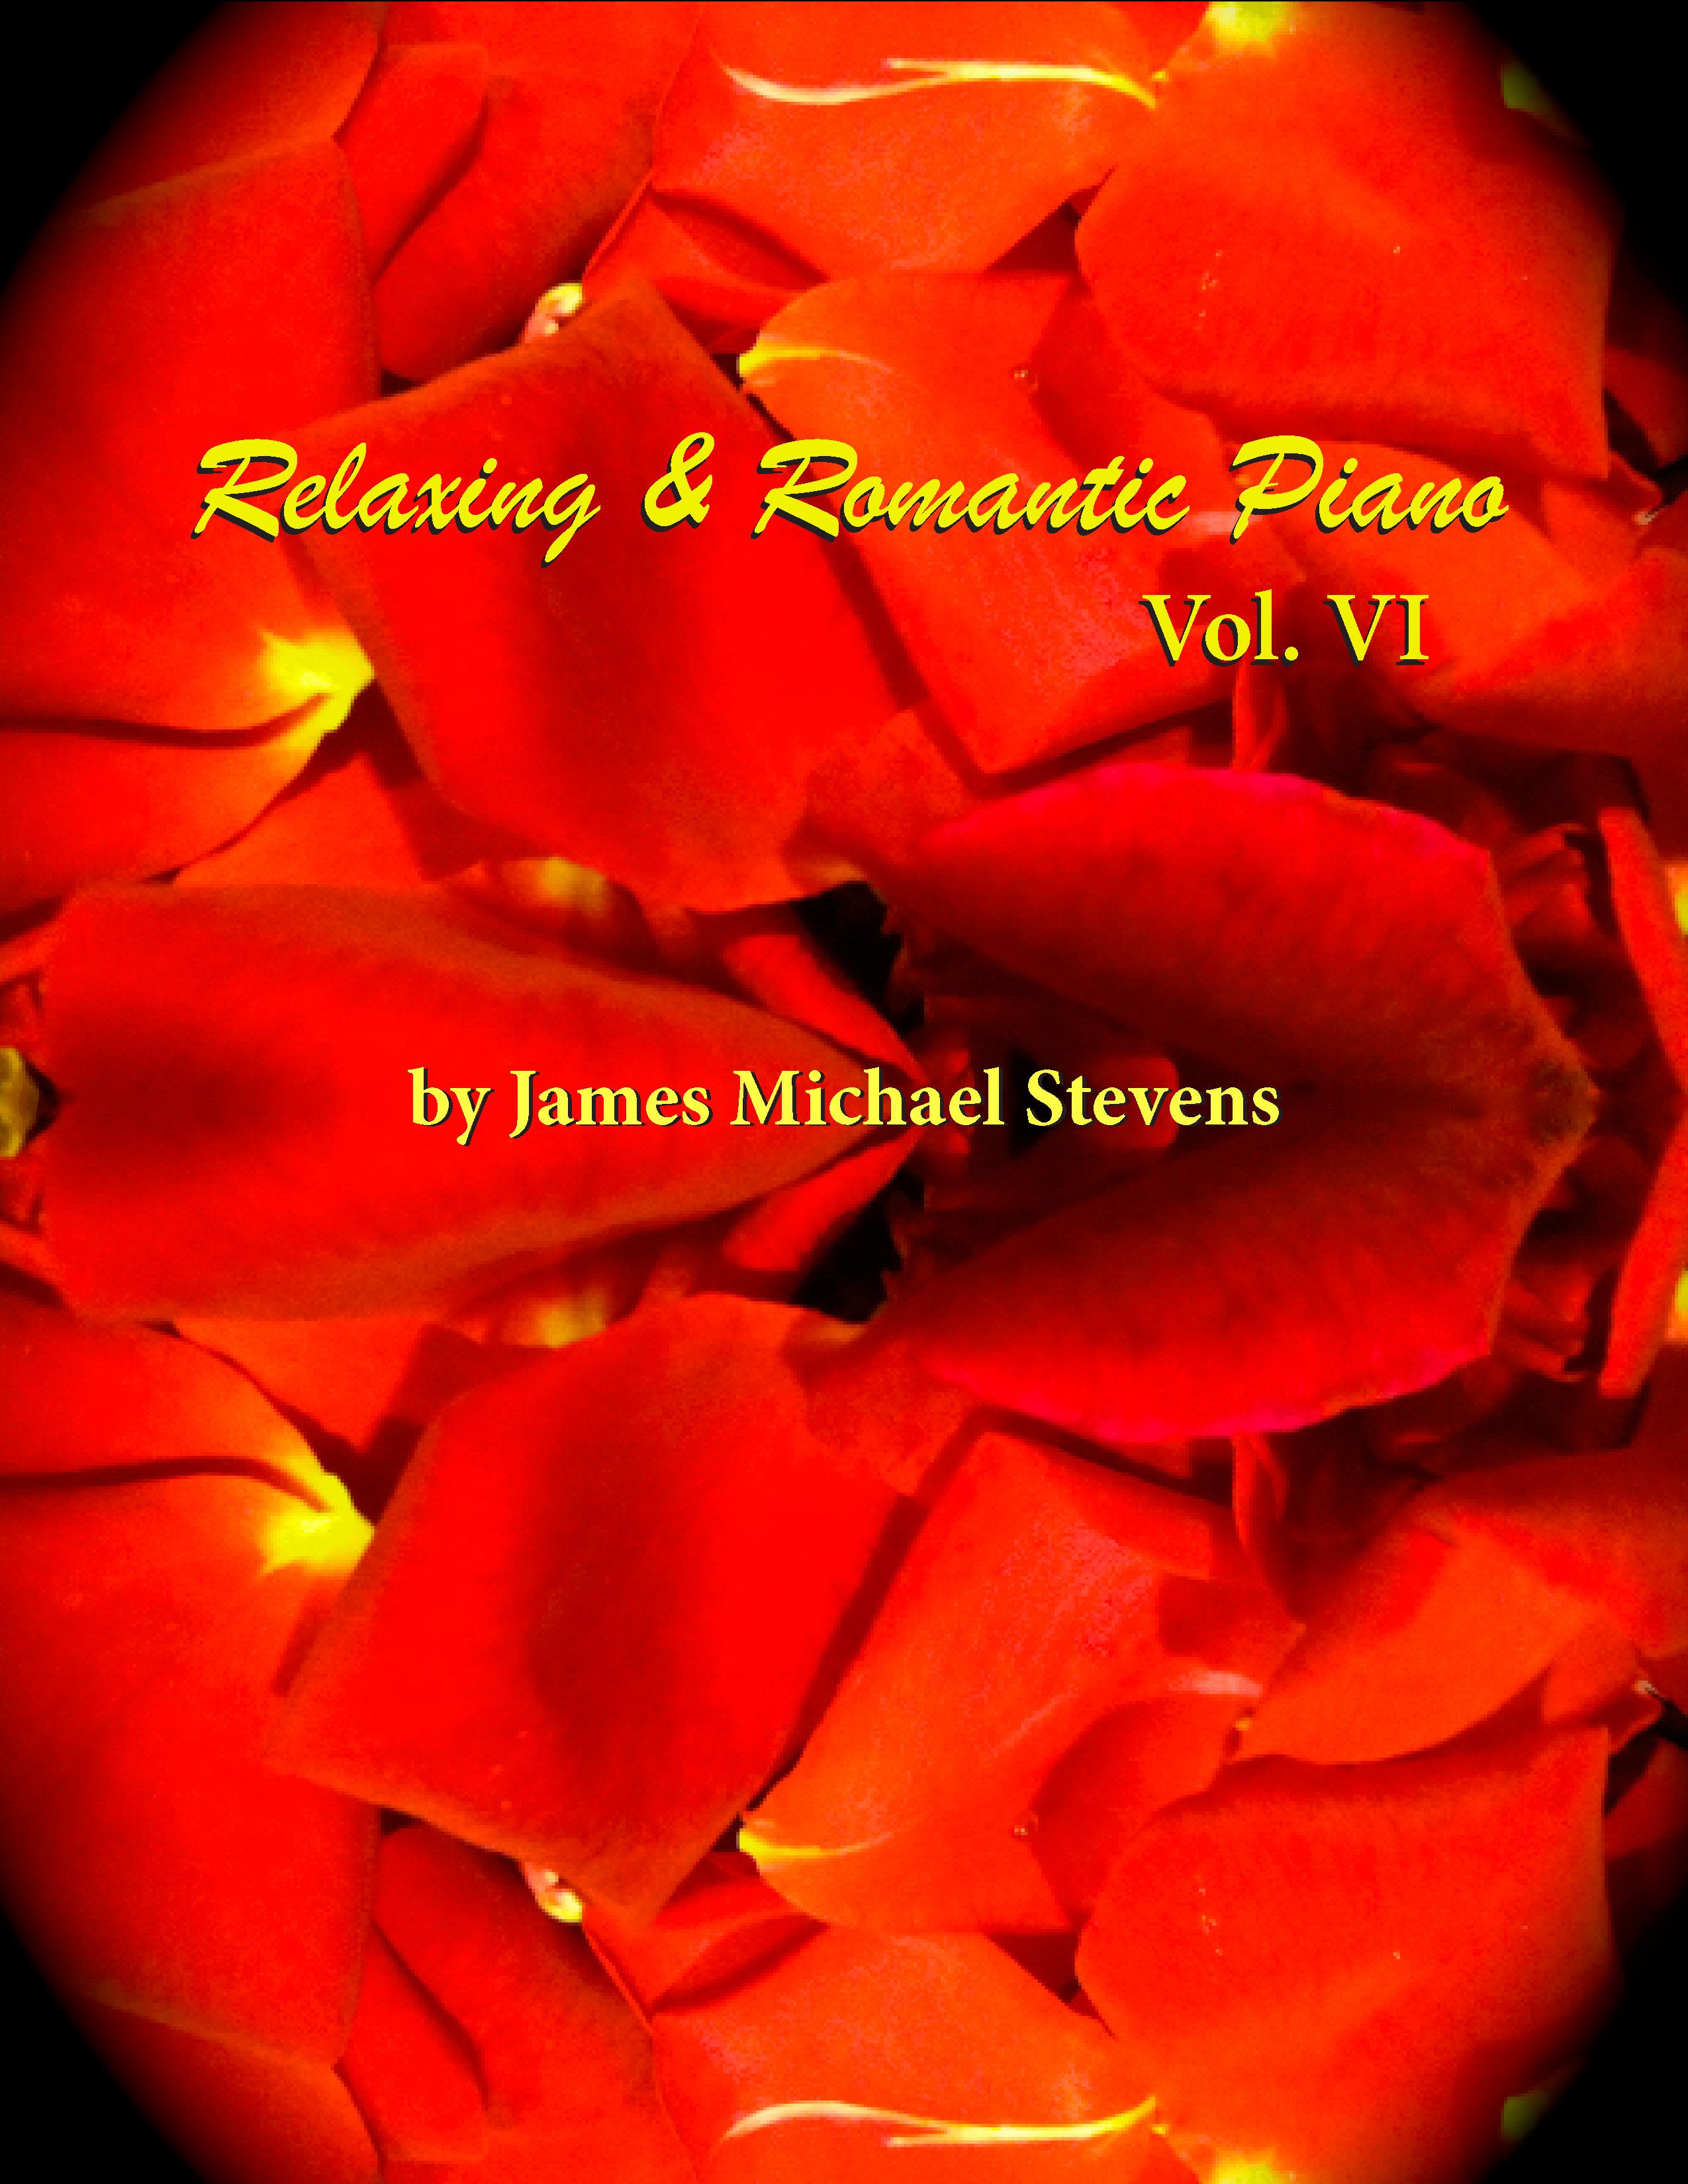 Relaxing & Romantic Piano, Vol. VI